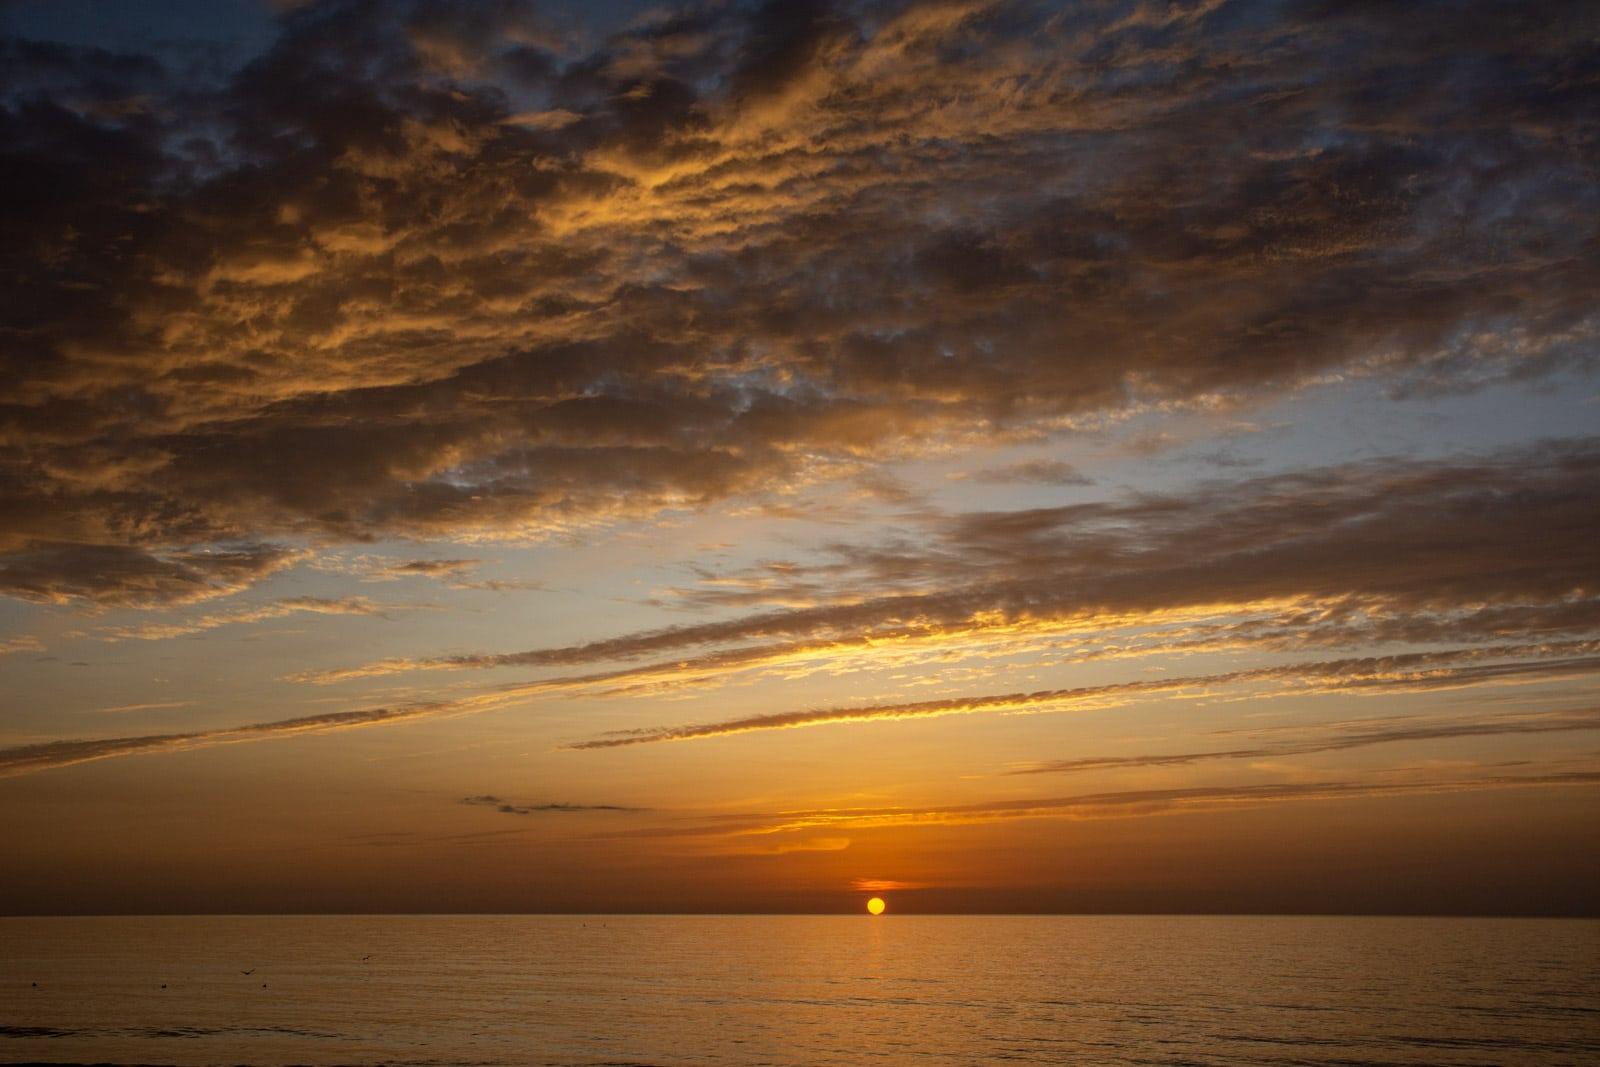 Floryda, wschód słońca